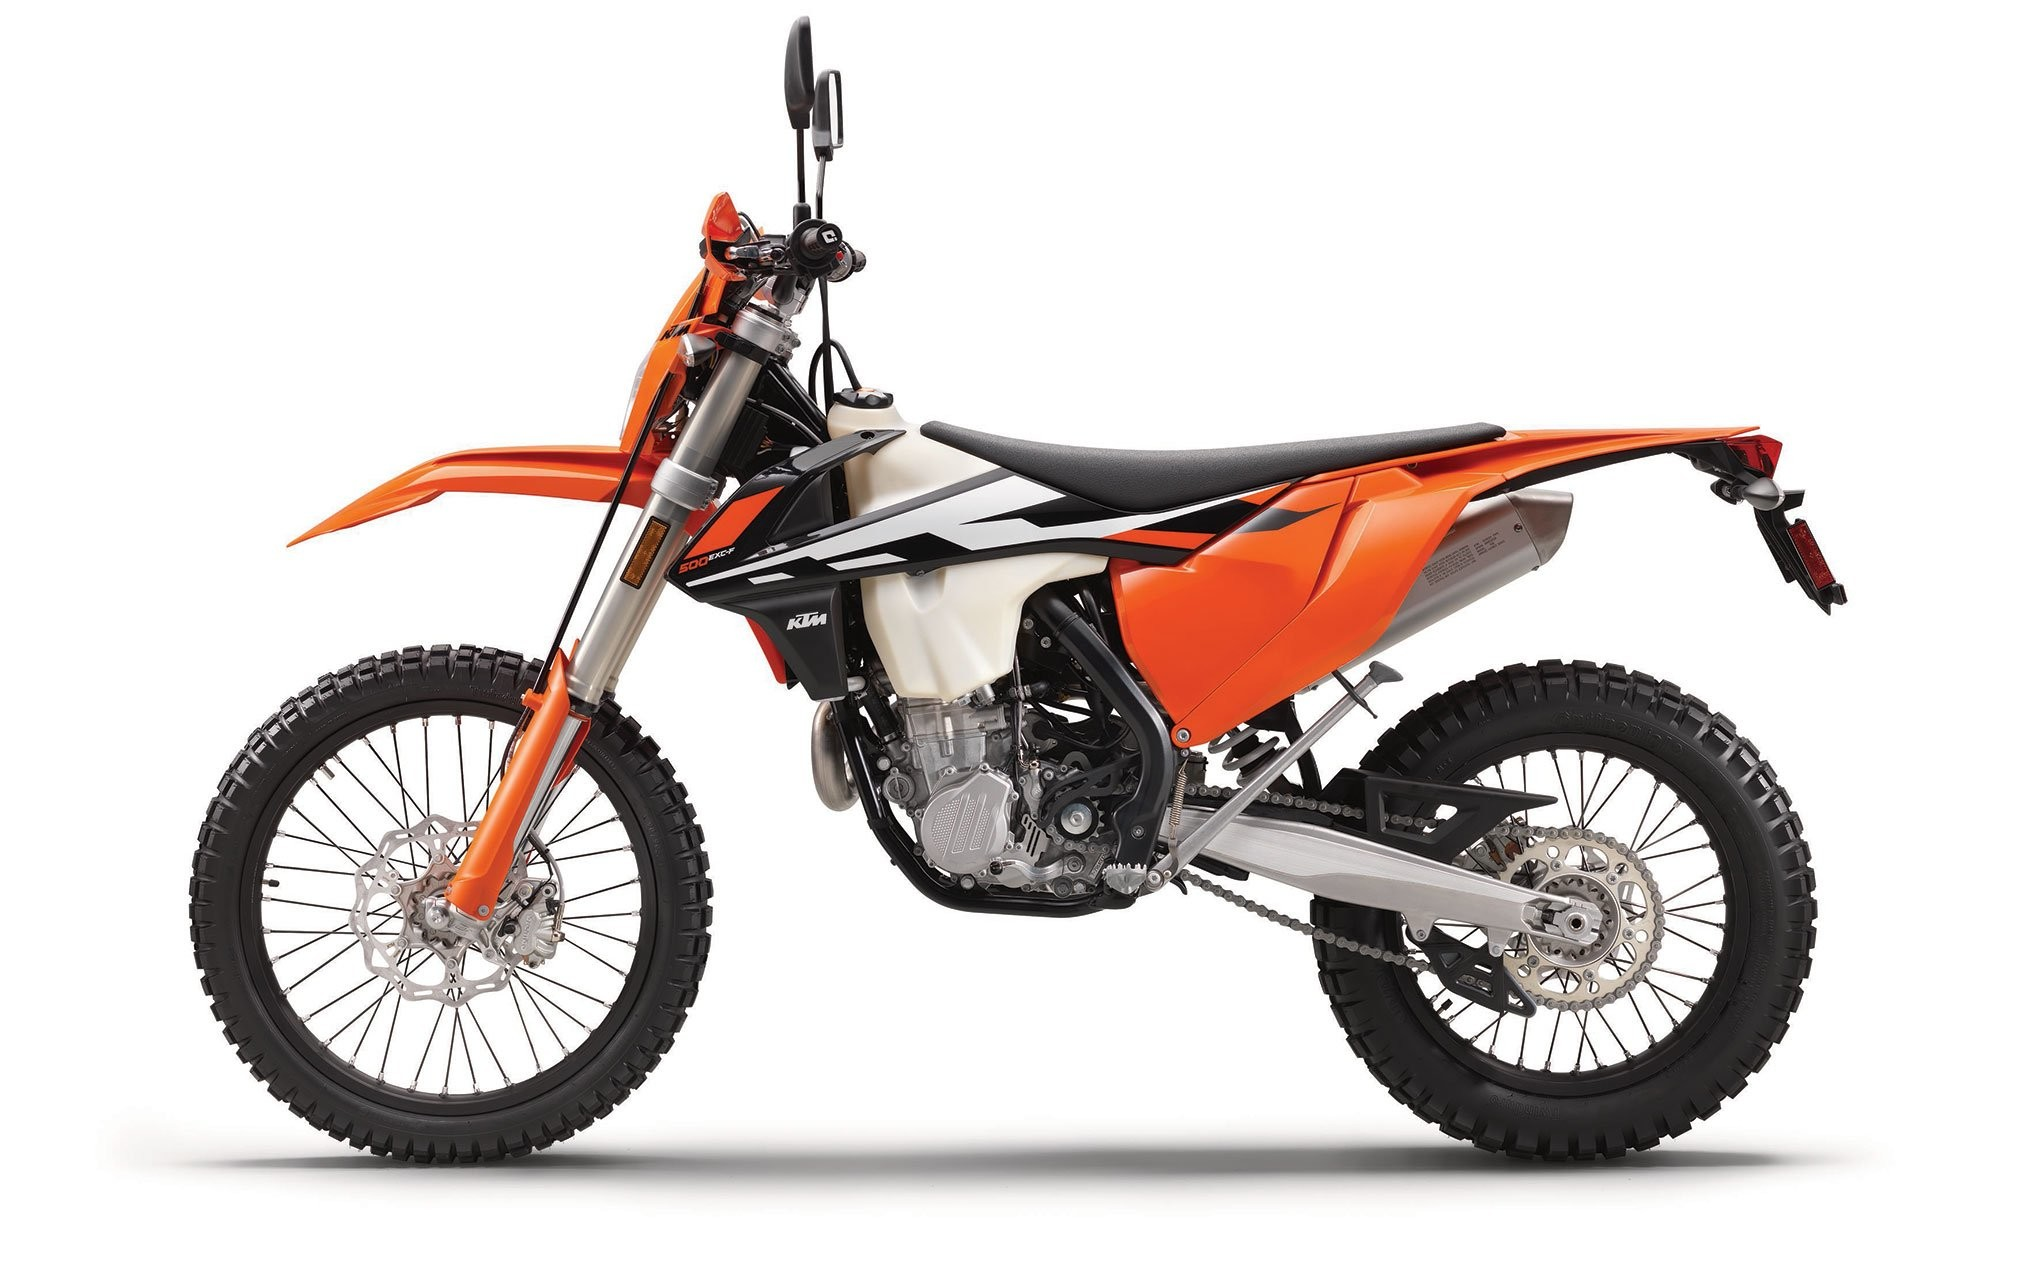 2017 KTM 500 EXC-F dirtbike bike dirt motorbike motorcycle moto motocross  wallpaper | | 976562 | WallpaperUP